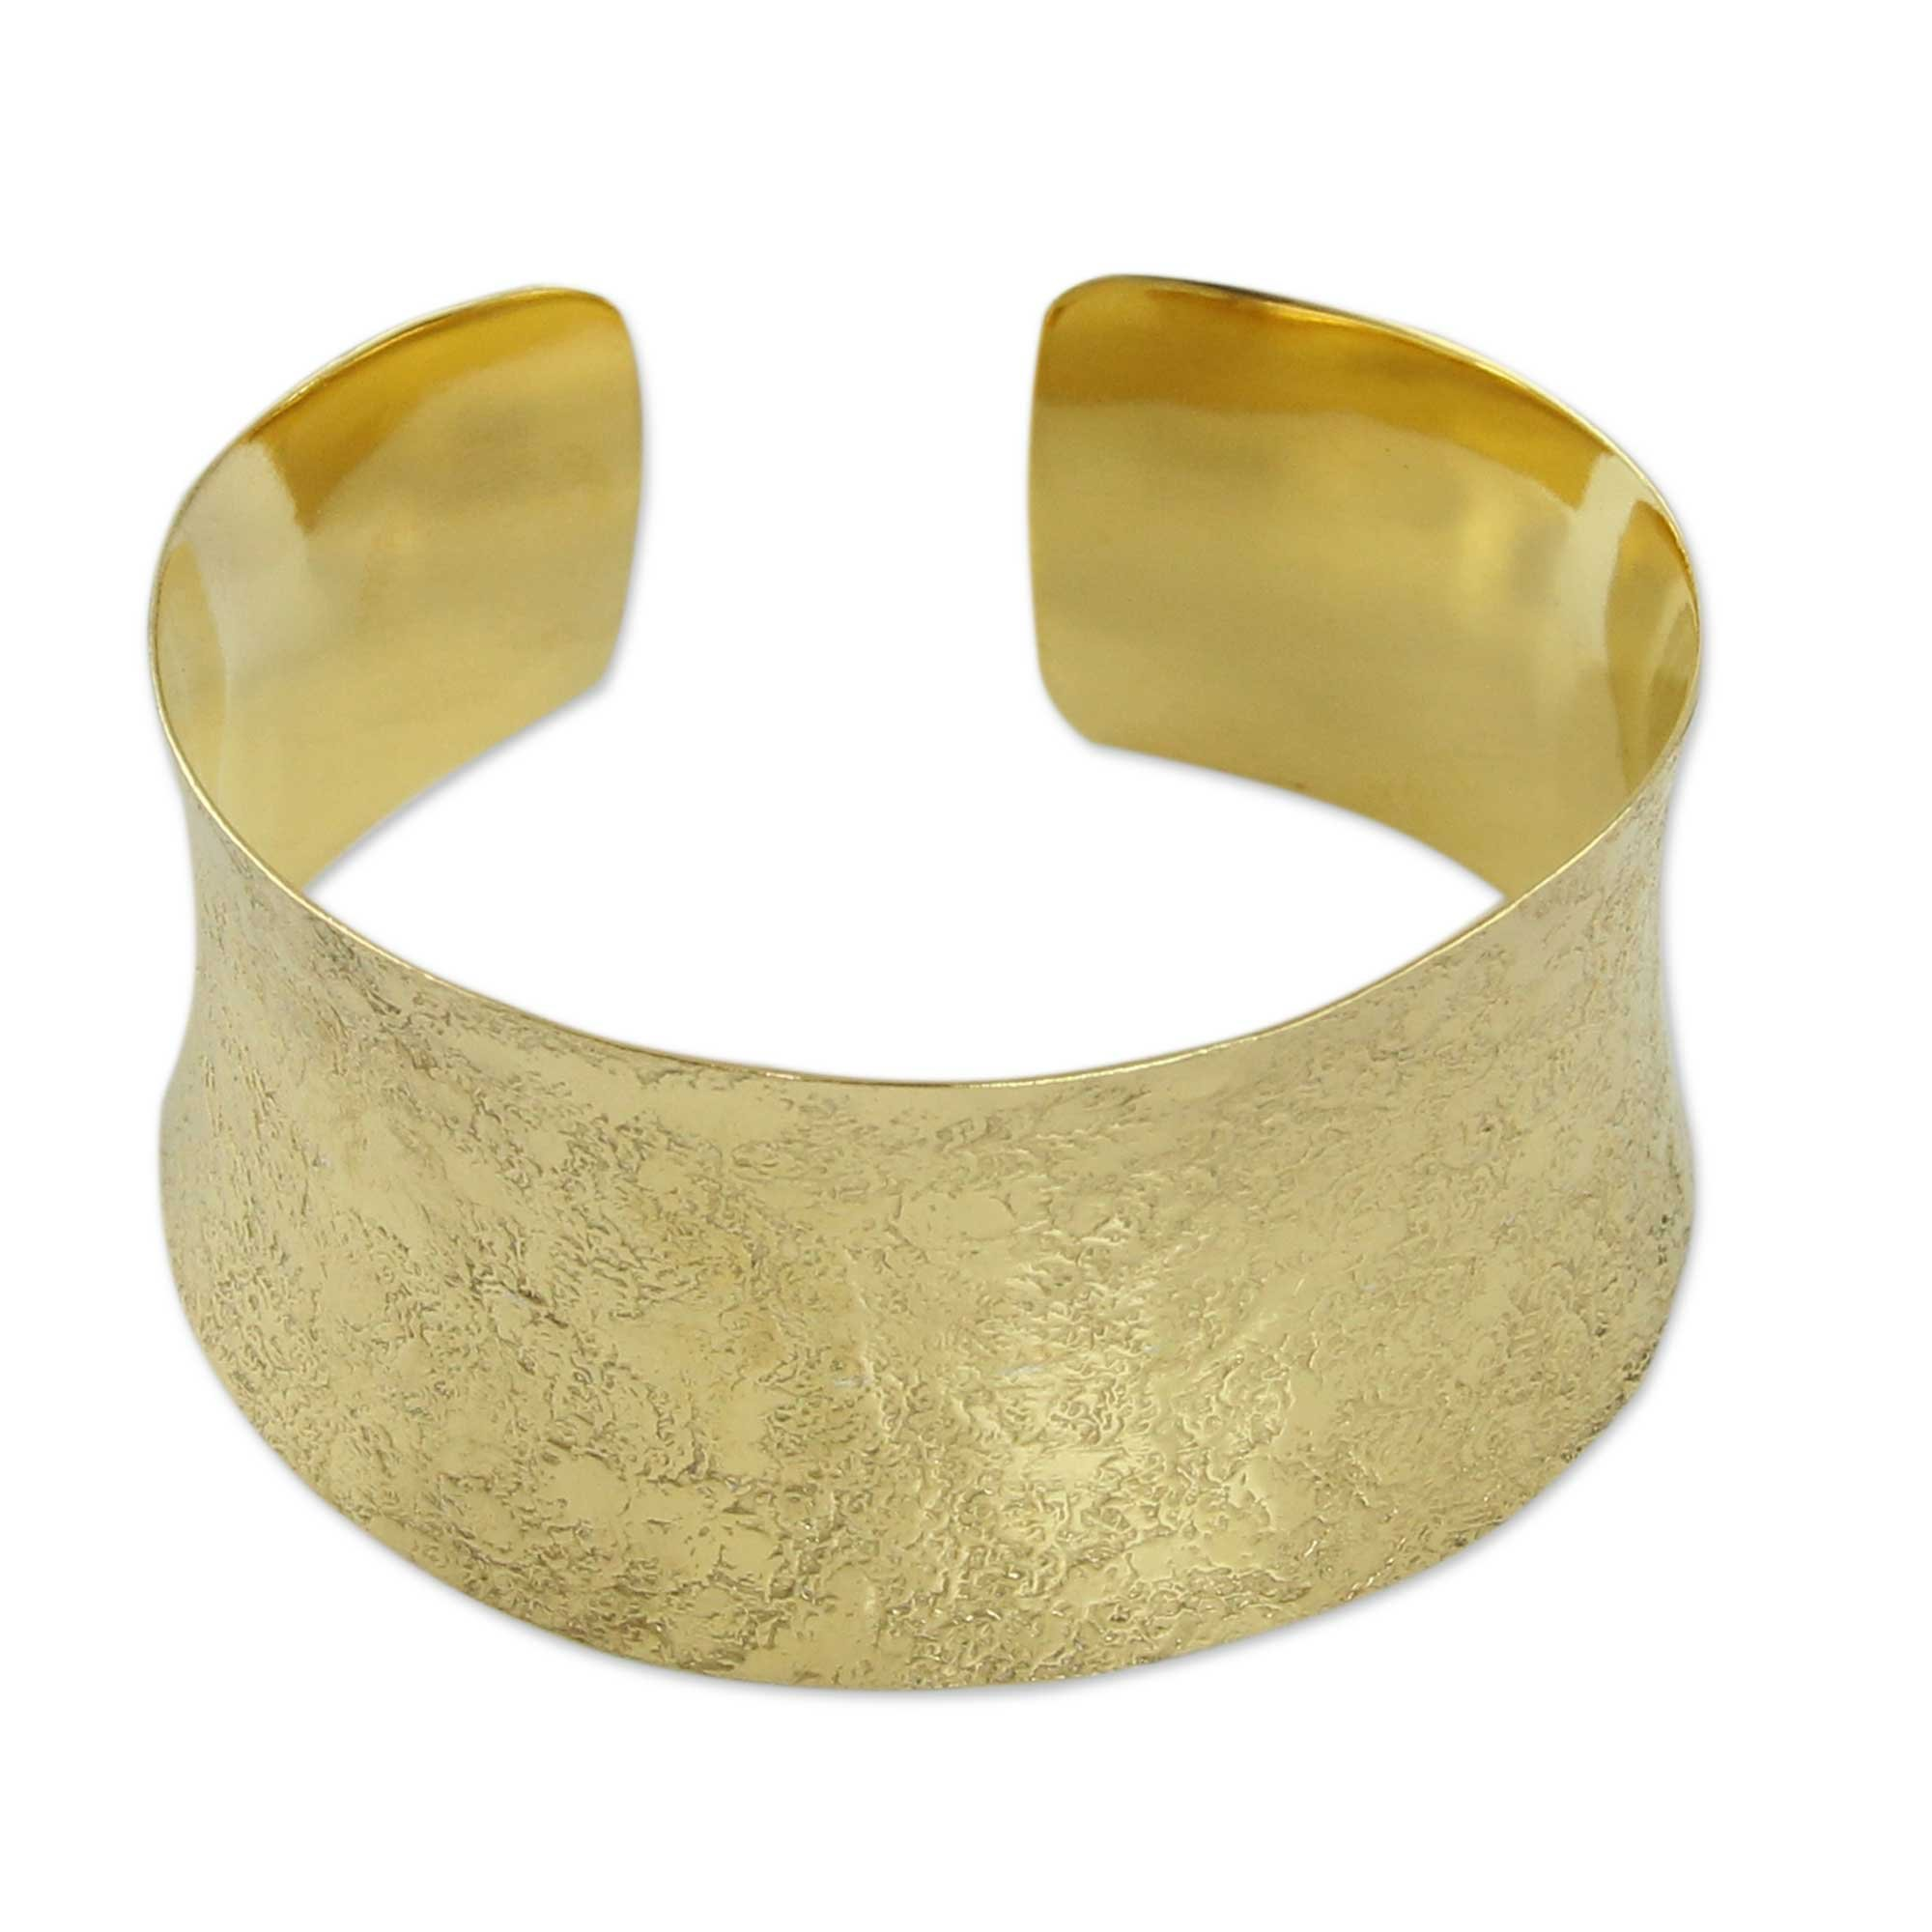 NOVICA .925 Sterling Silver Cuff Bracelet, 'Summer Skies'